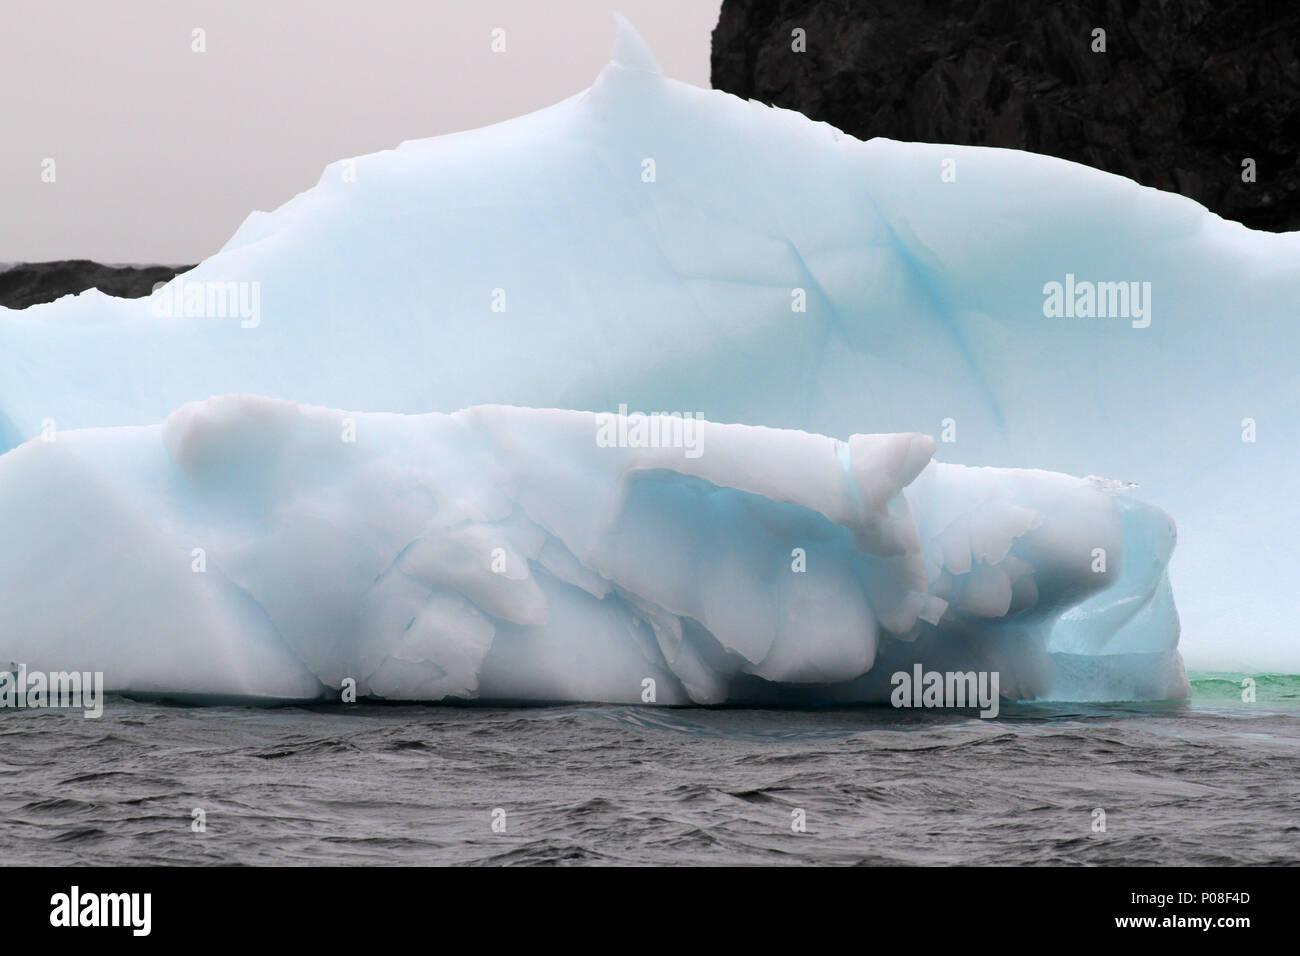 Ice berg  in the Atlantic Ocean off the coast of Newfoundland, Canada - Stock Image